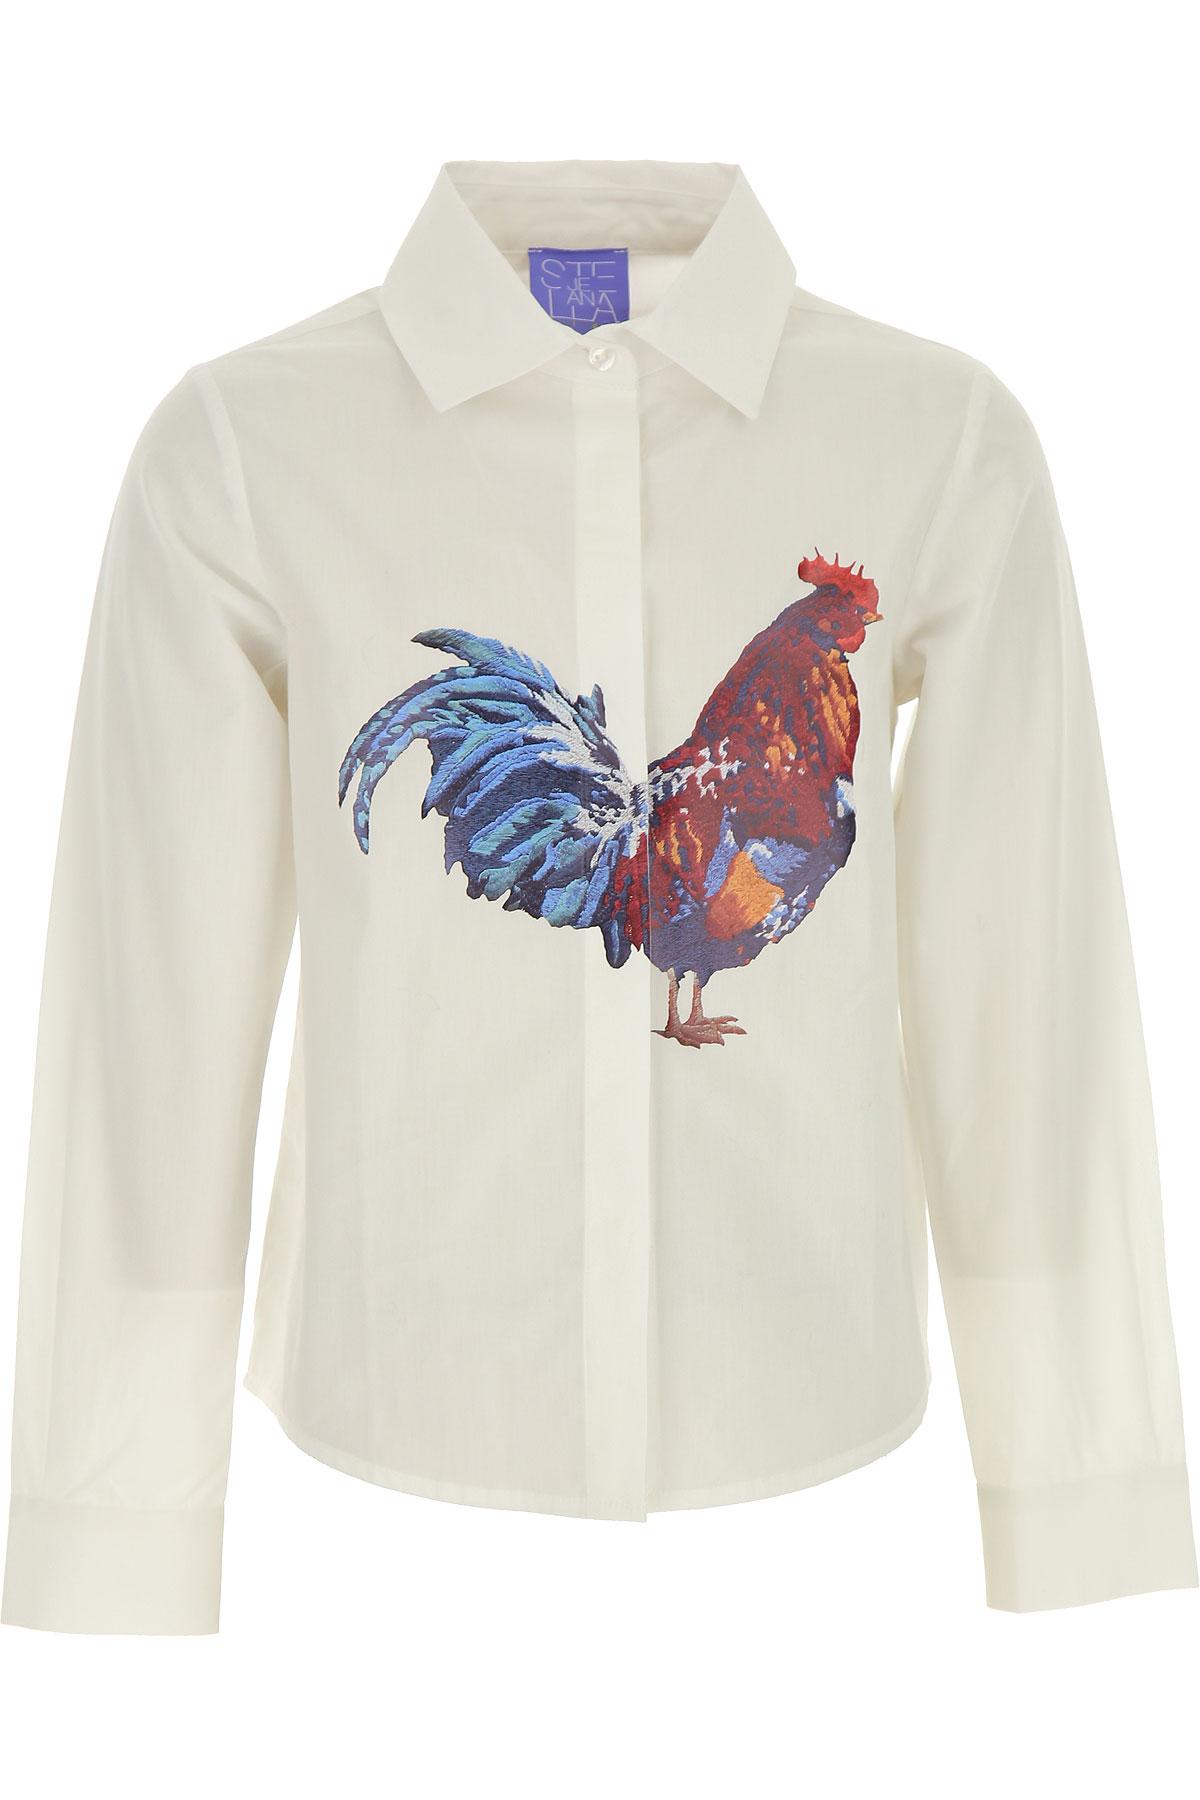 Stella Jean Kids Shirts for Girls On Sale, White, Cotton, 2019, 10Y 4Y 6Y 8Y